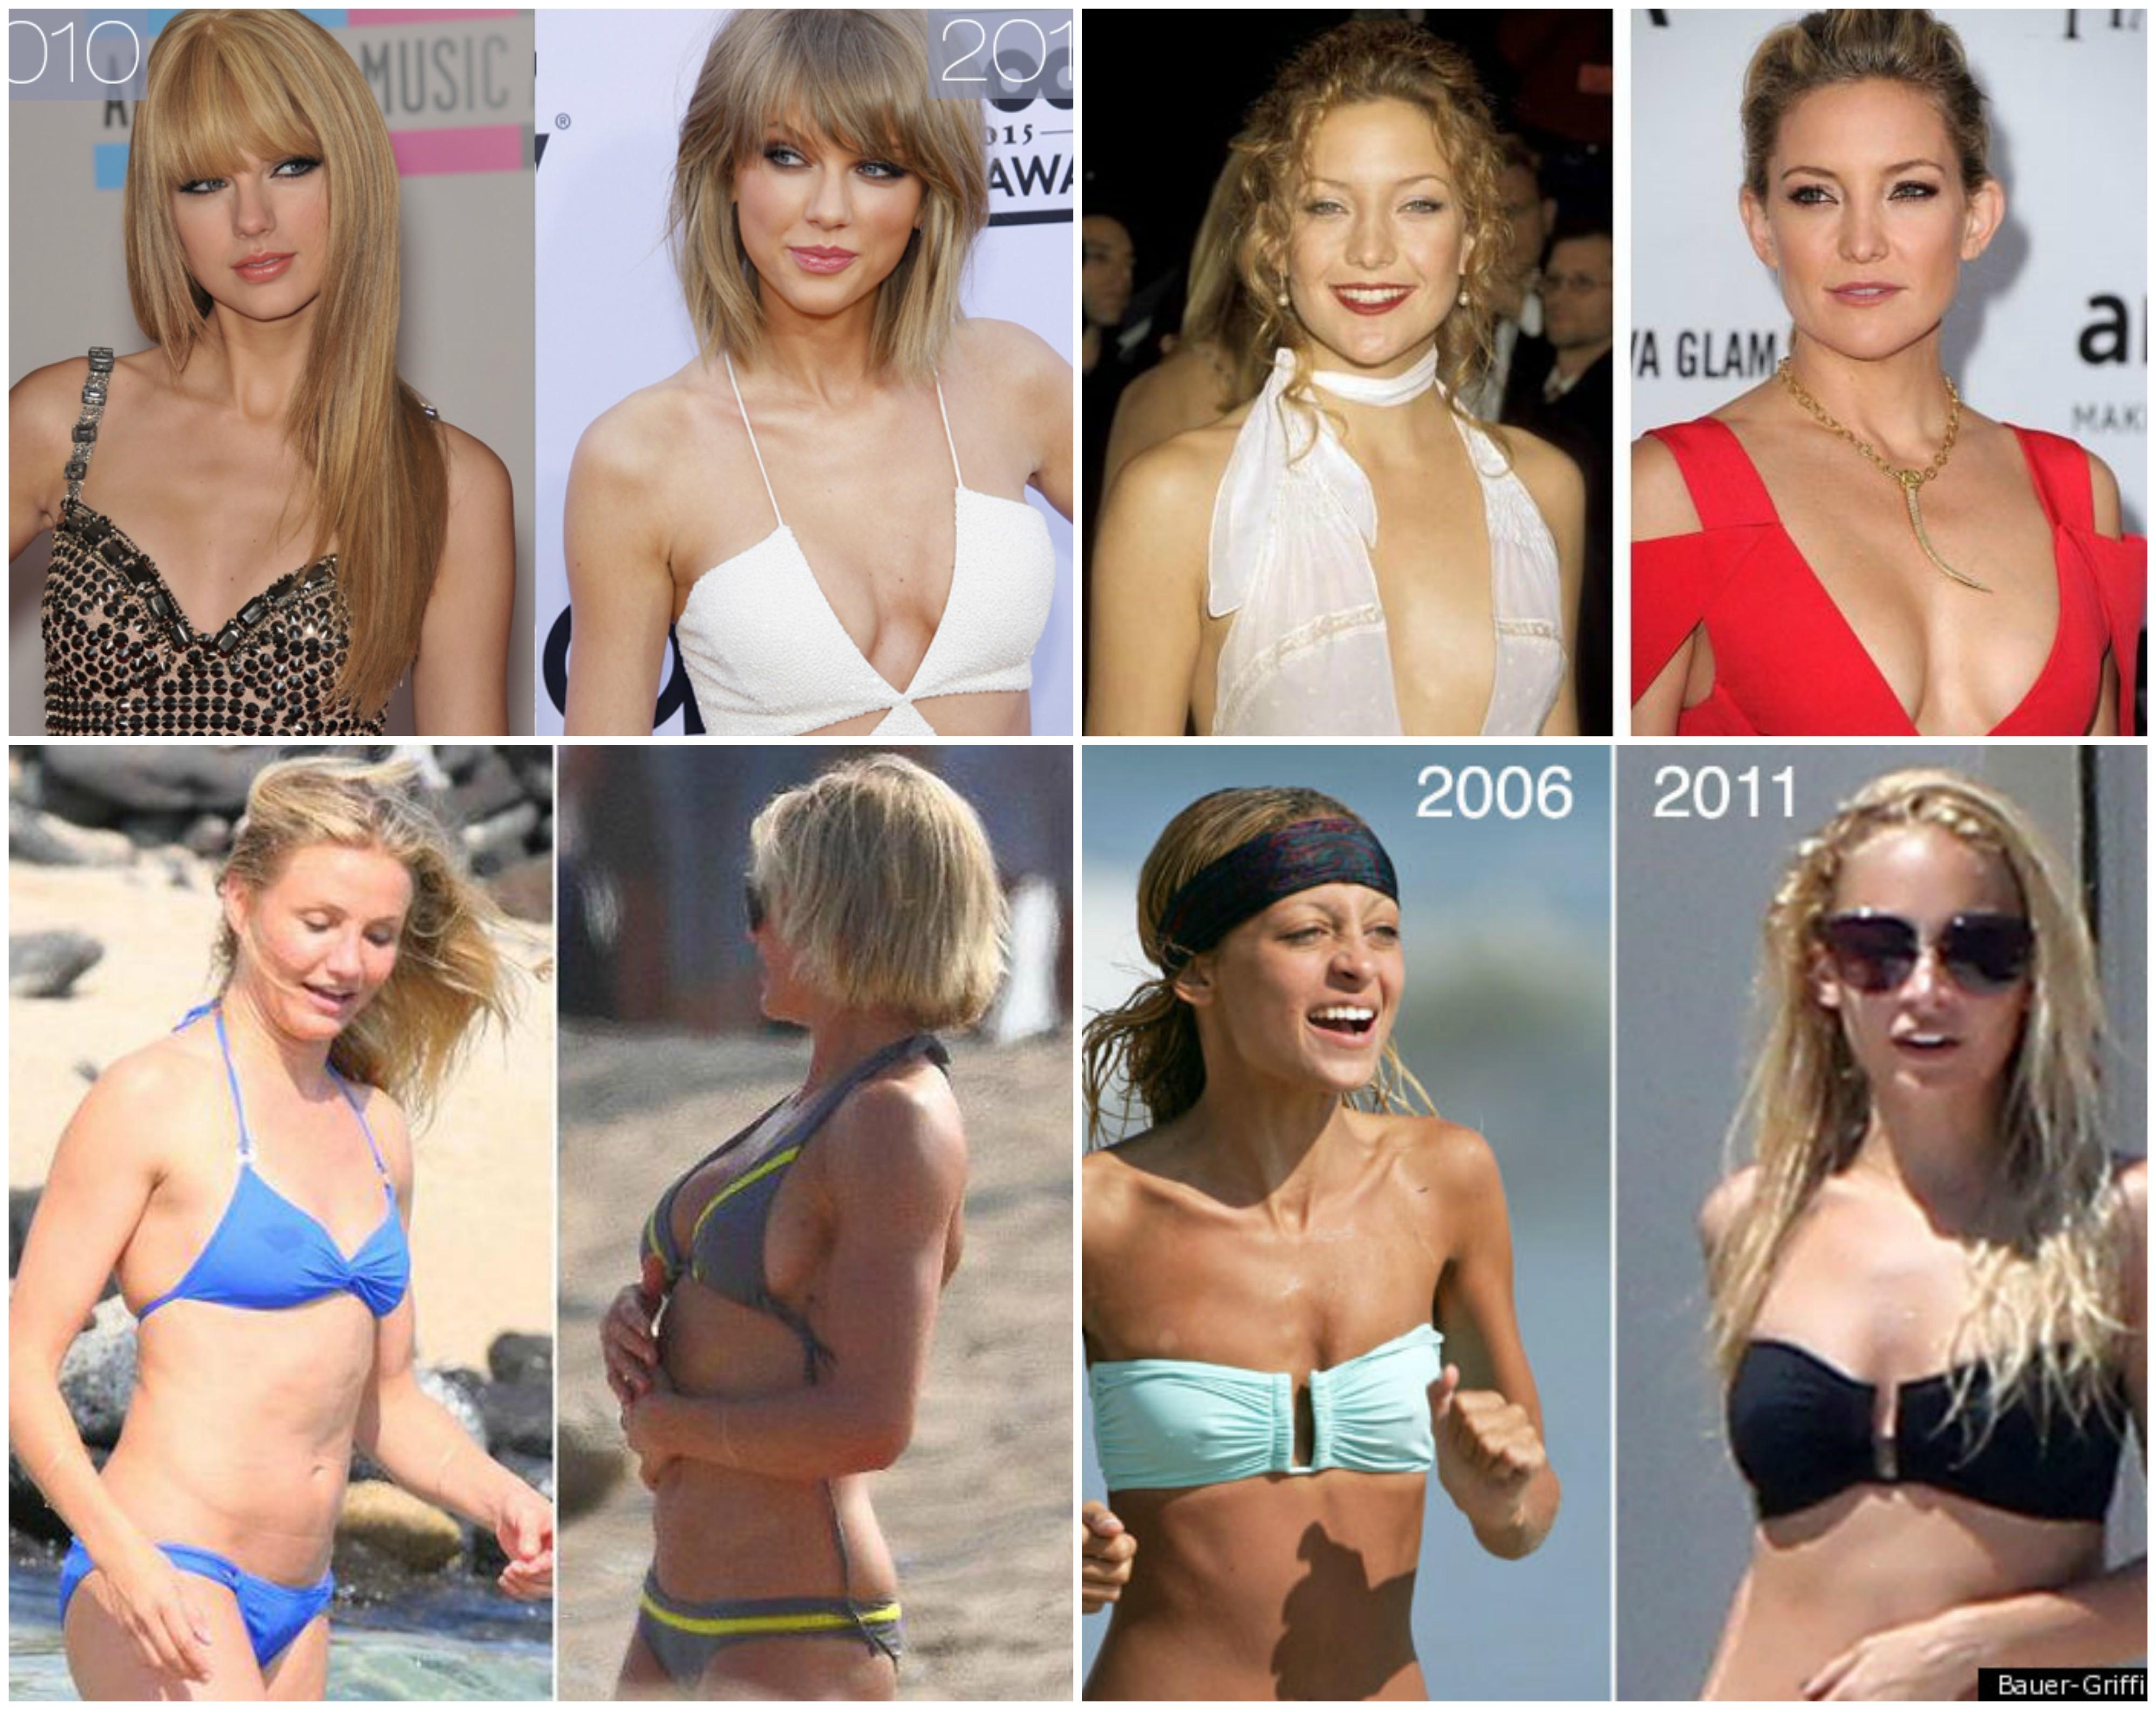 Nicoles breast augmentation website